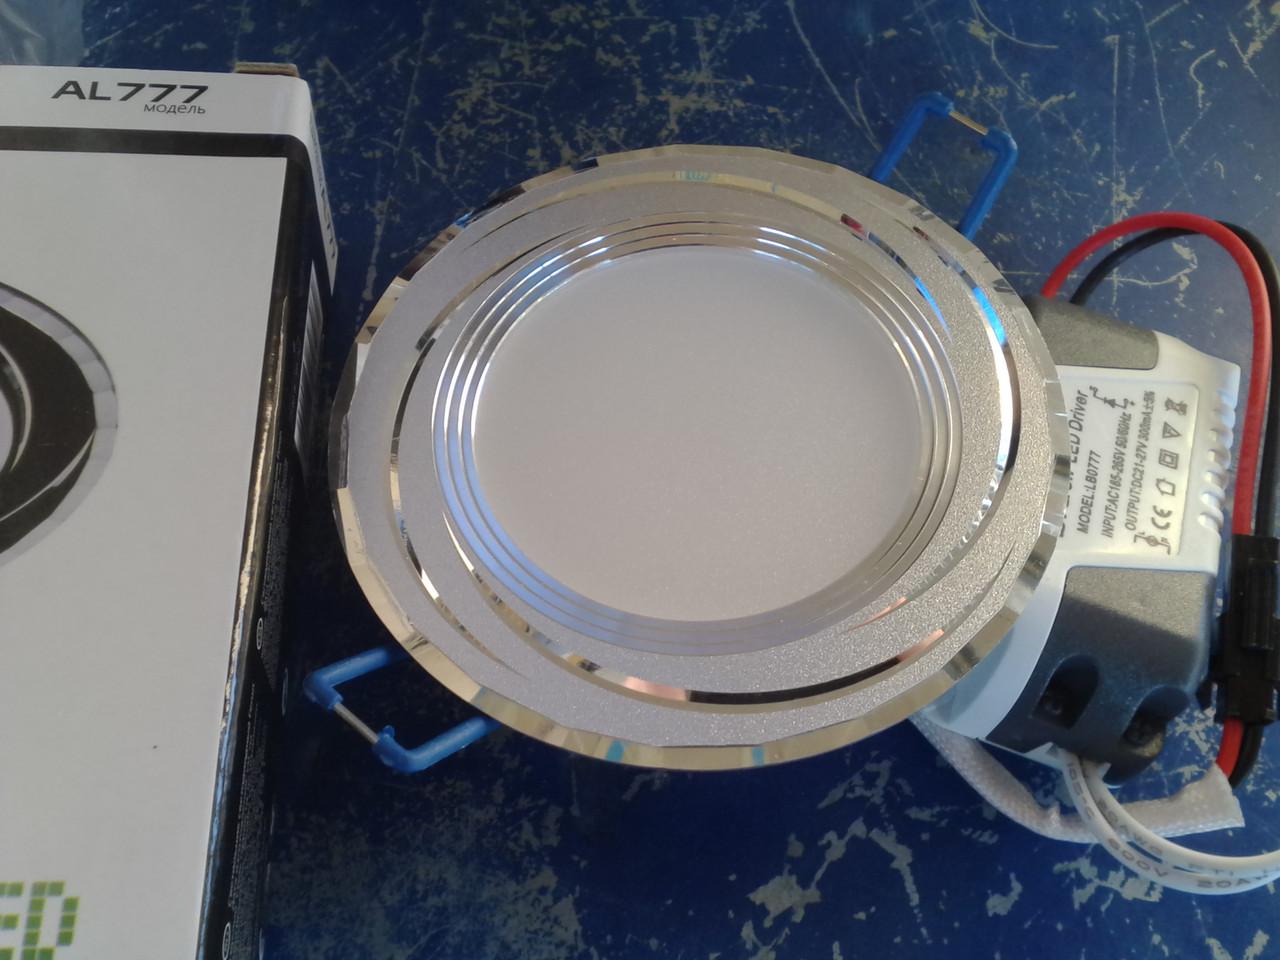 Светодиодная панель 5w Feron AL777 5w 10LED 400Lm